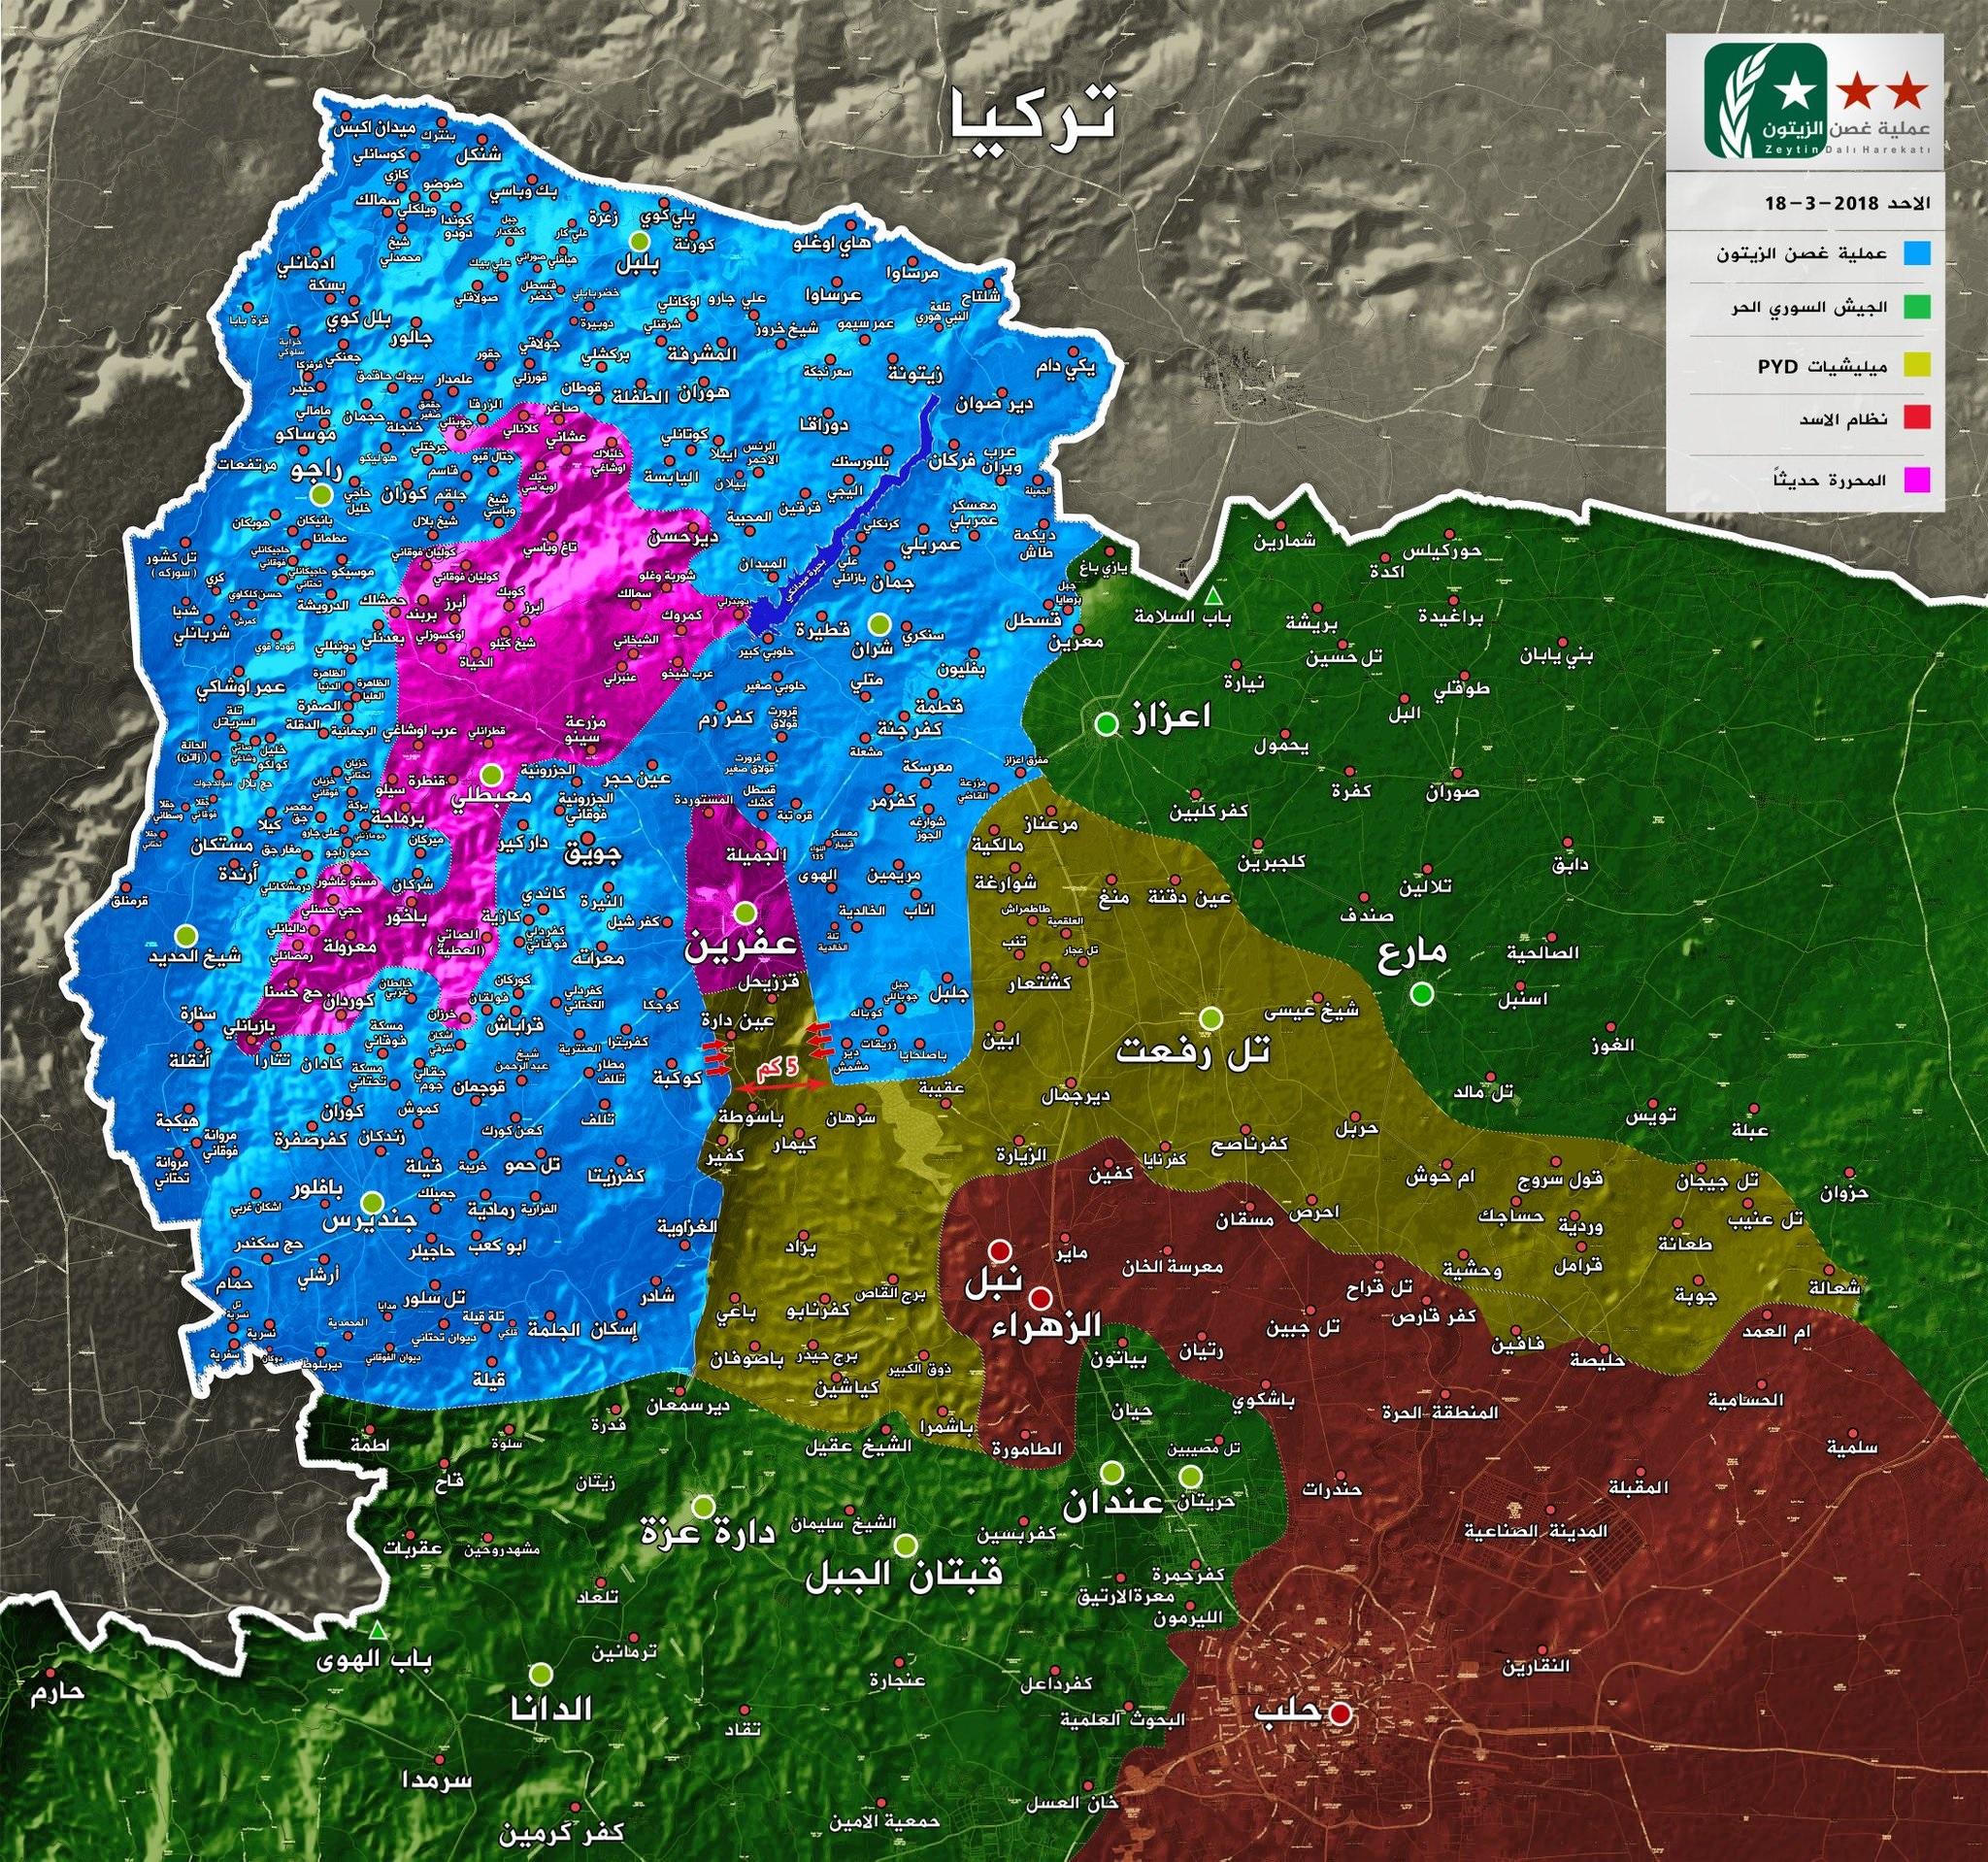 Turkish Army Captured Dozens Of Villages North And Northwest Of Afrin (Map)